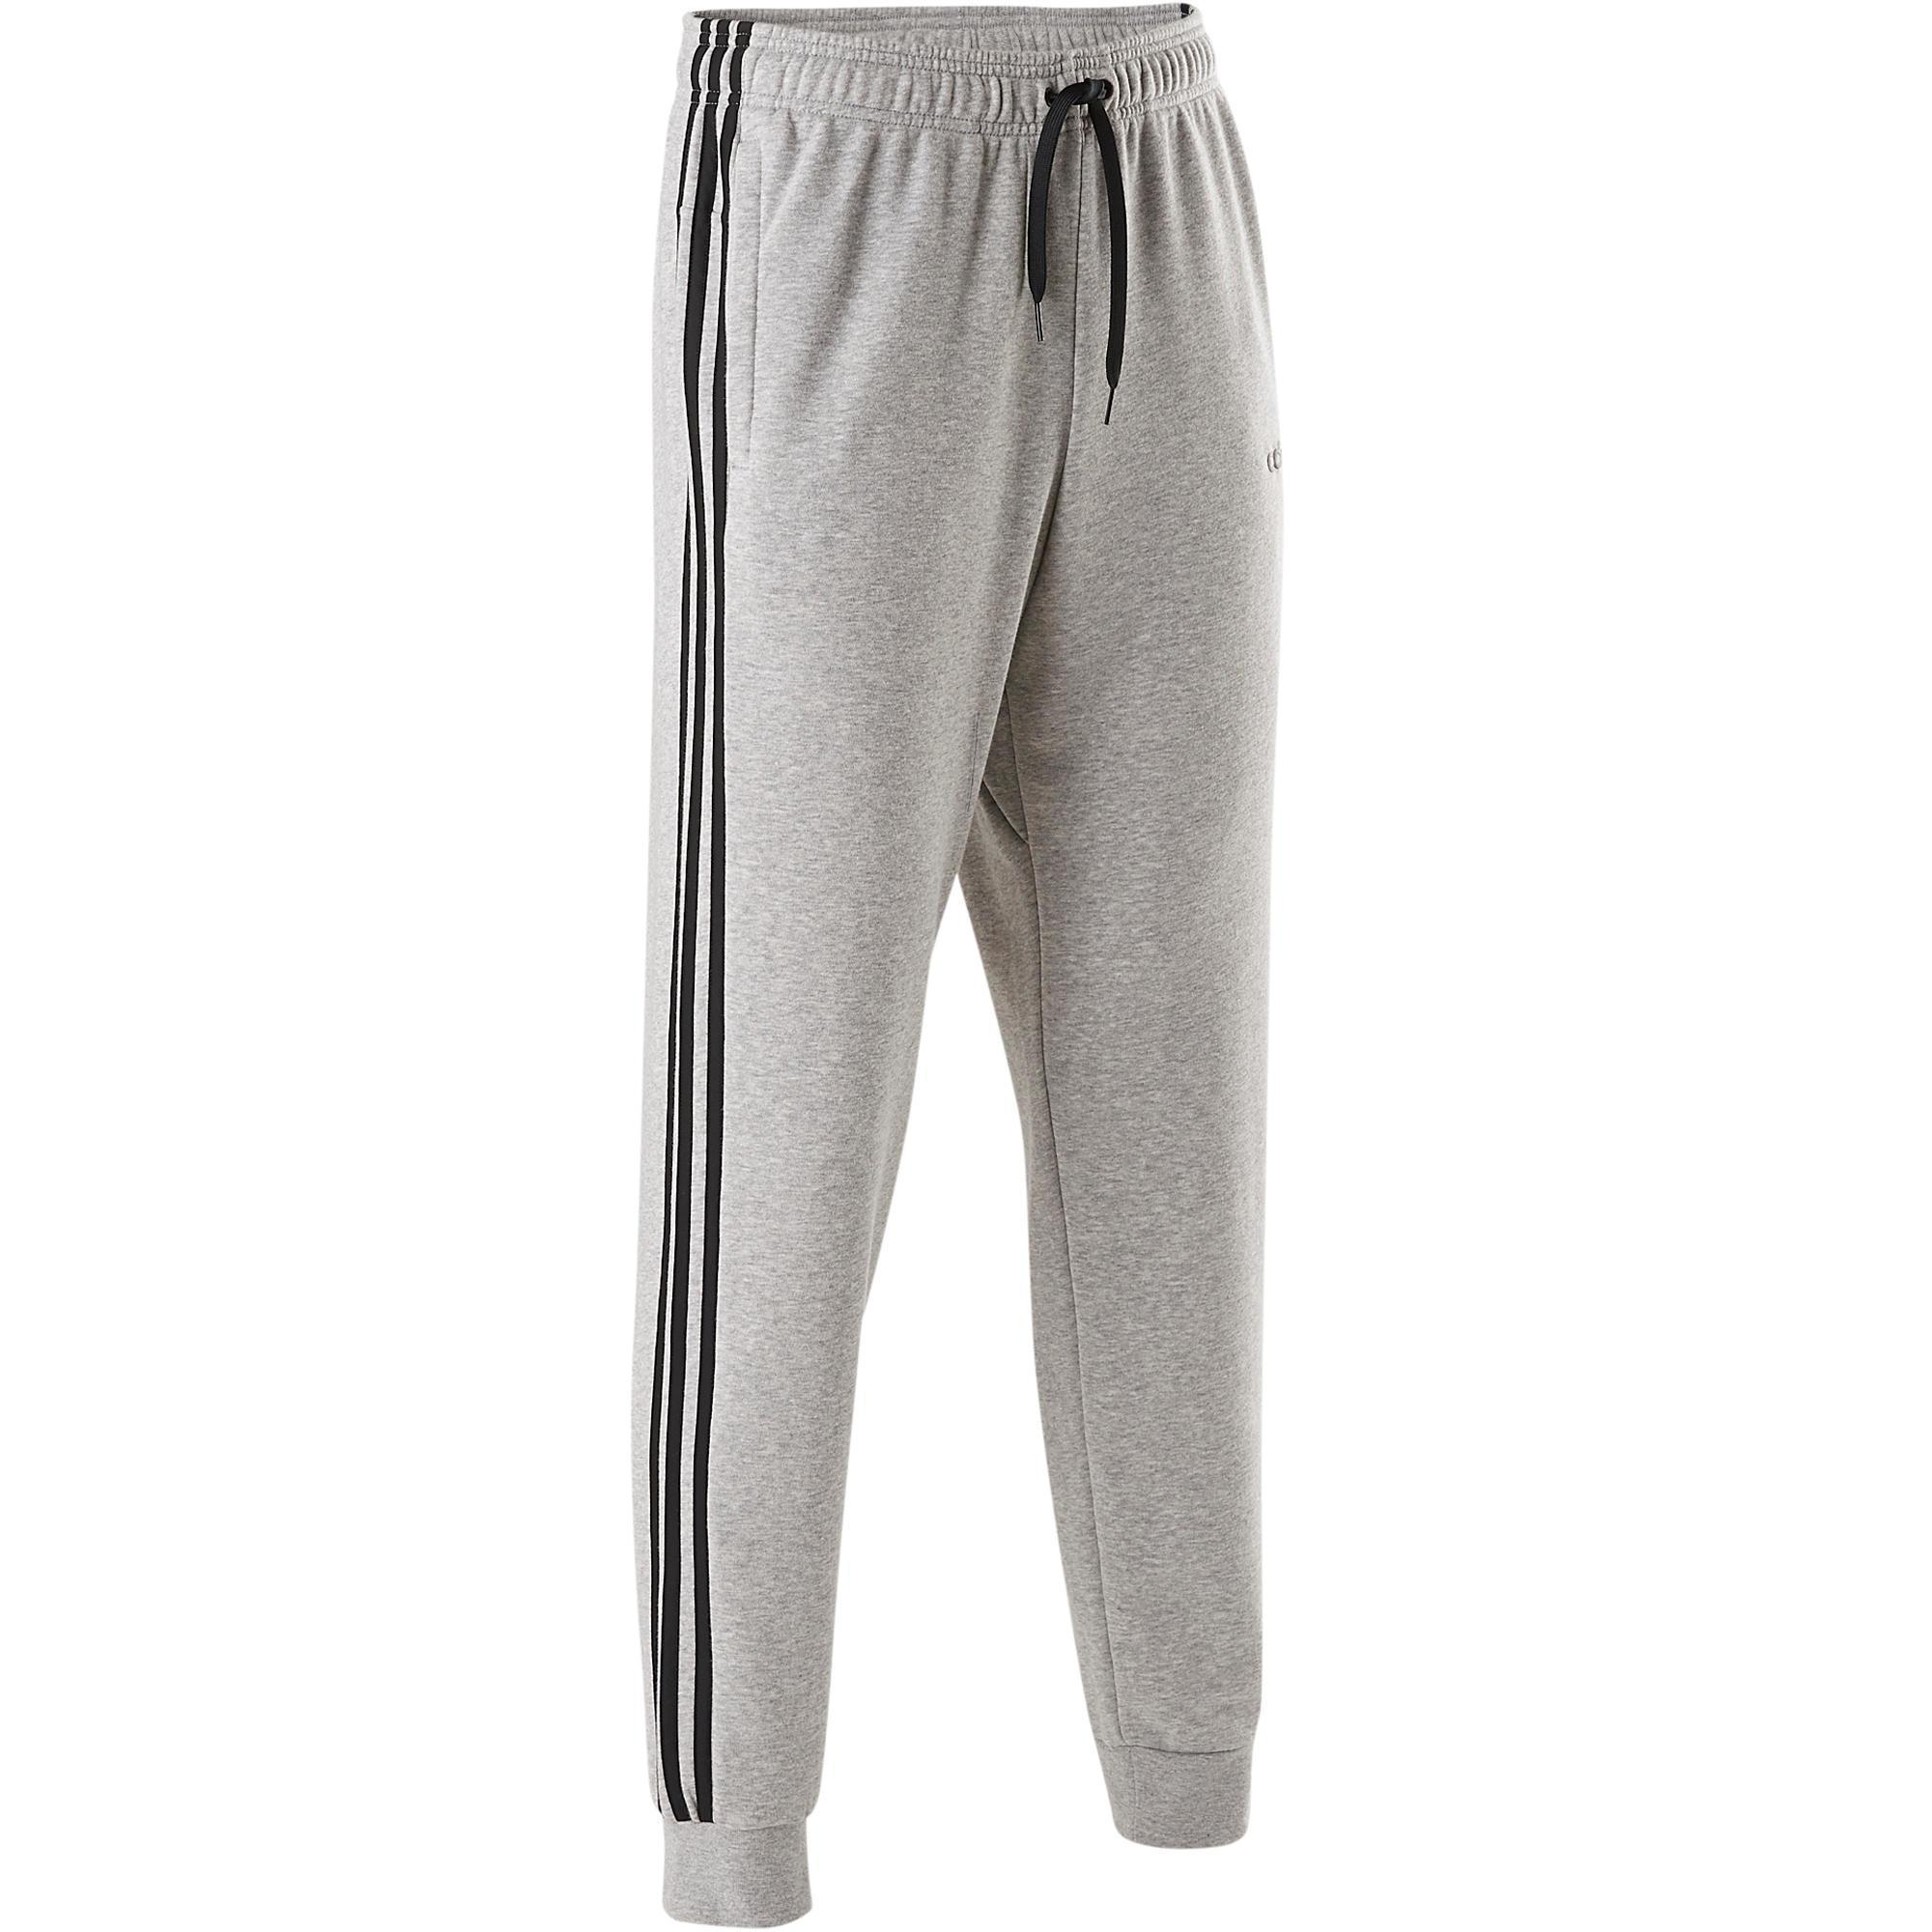 Jogginghose 3S Pilates sanfte Gymnastik Herren grau   Sportbekleidung > Sporthosen > Jogginghosen   Grau   Adidas